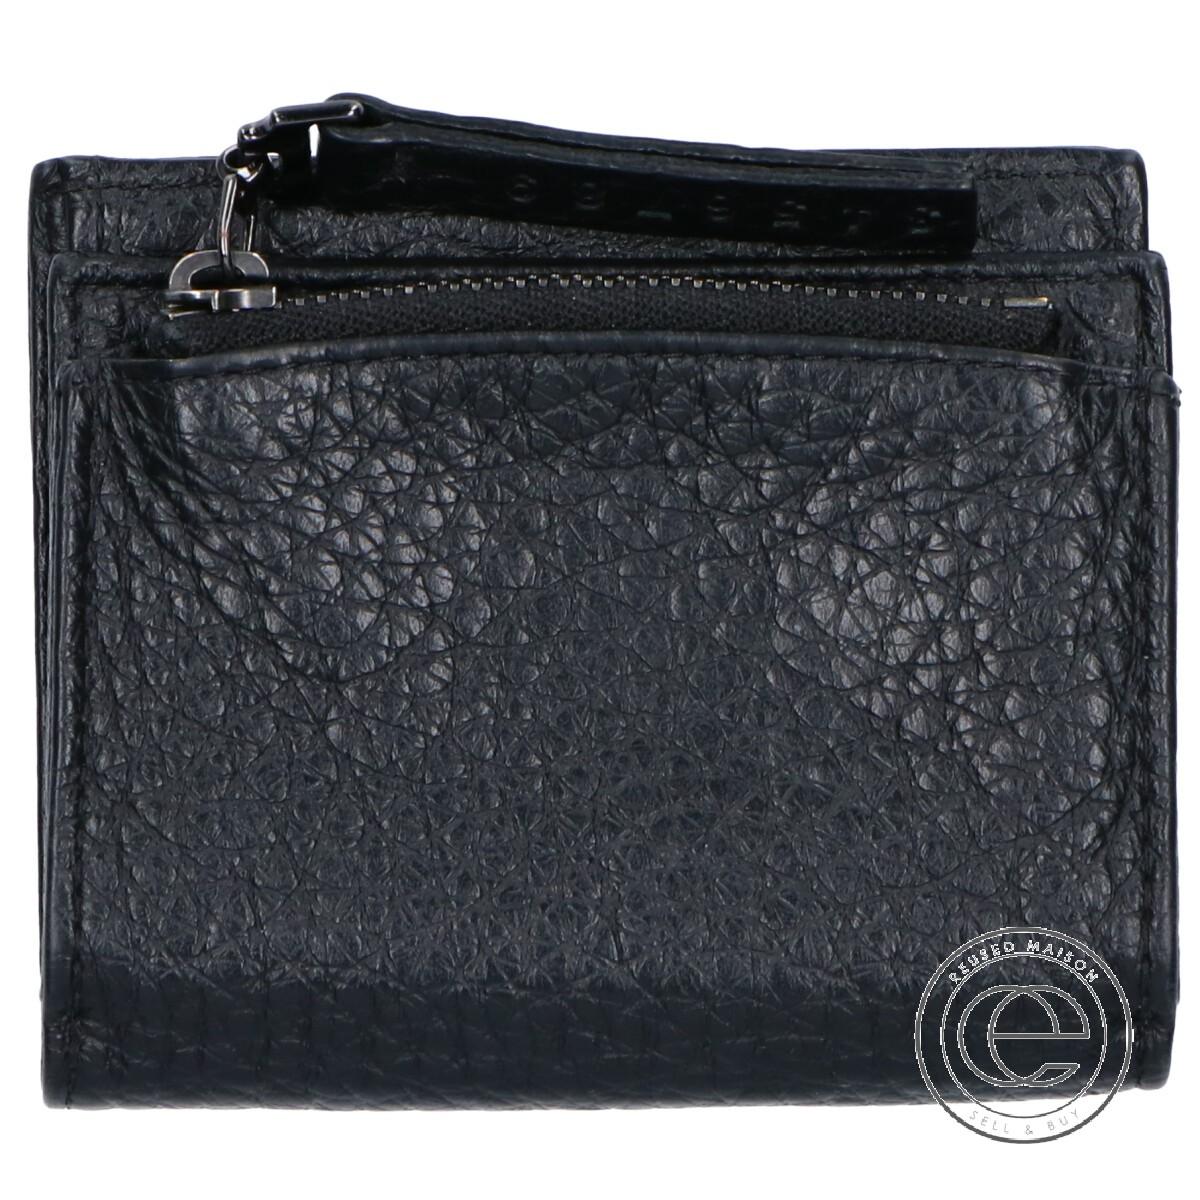 Maison Margiela メゾンマルジェラ #11 シボ革 二つ折り コンパクトウォレット 二つ折り財布(小銭入れあり) ブラック レディース 【中古】